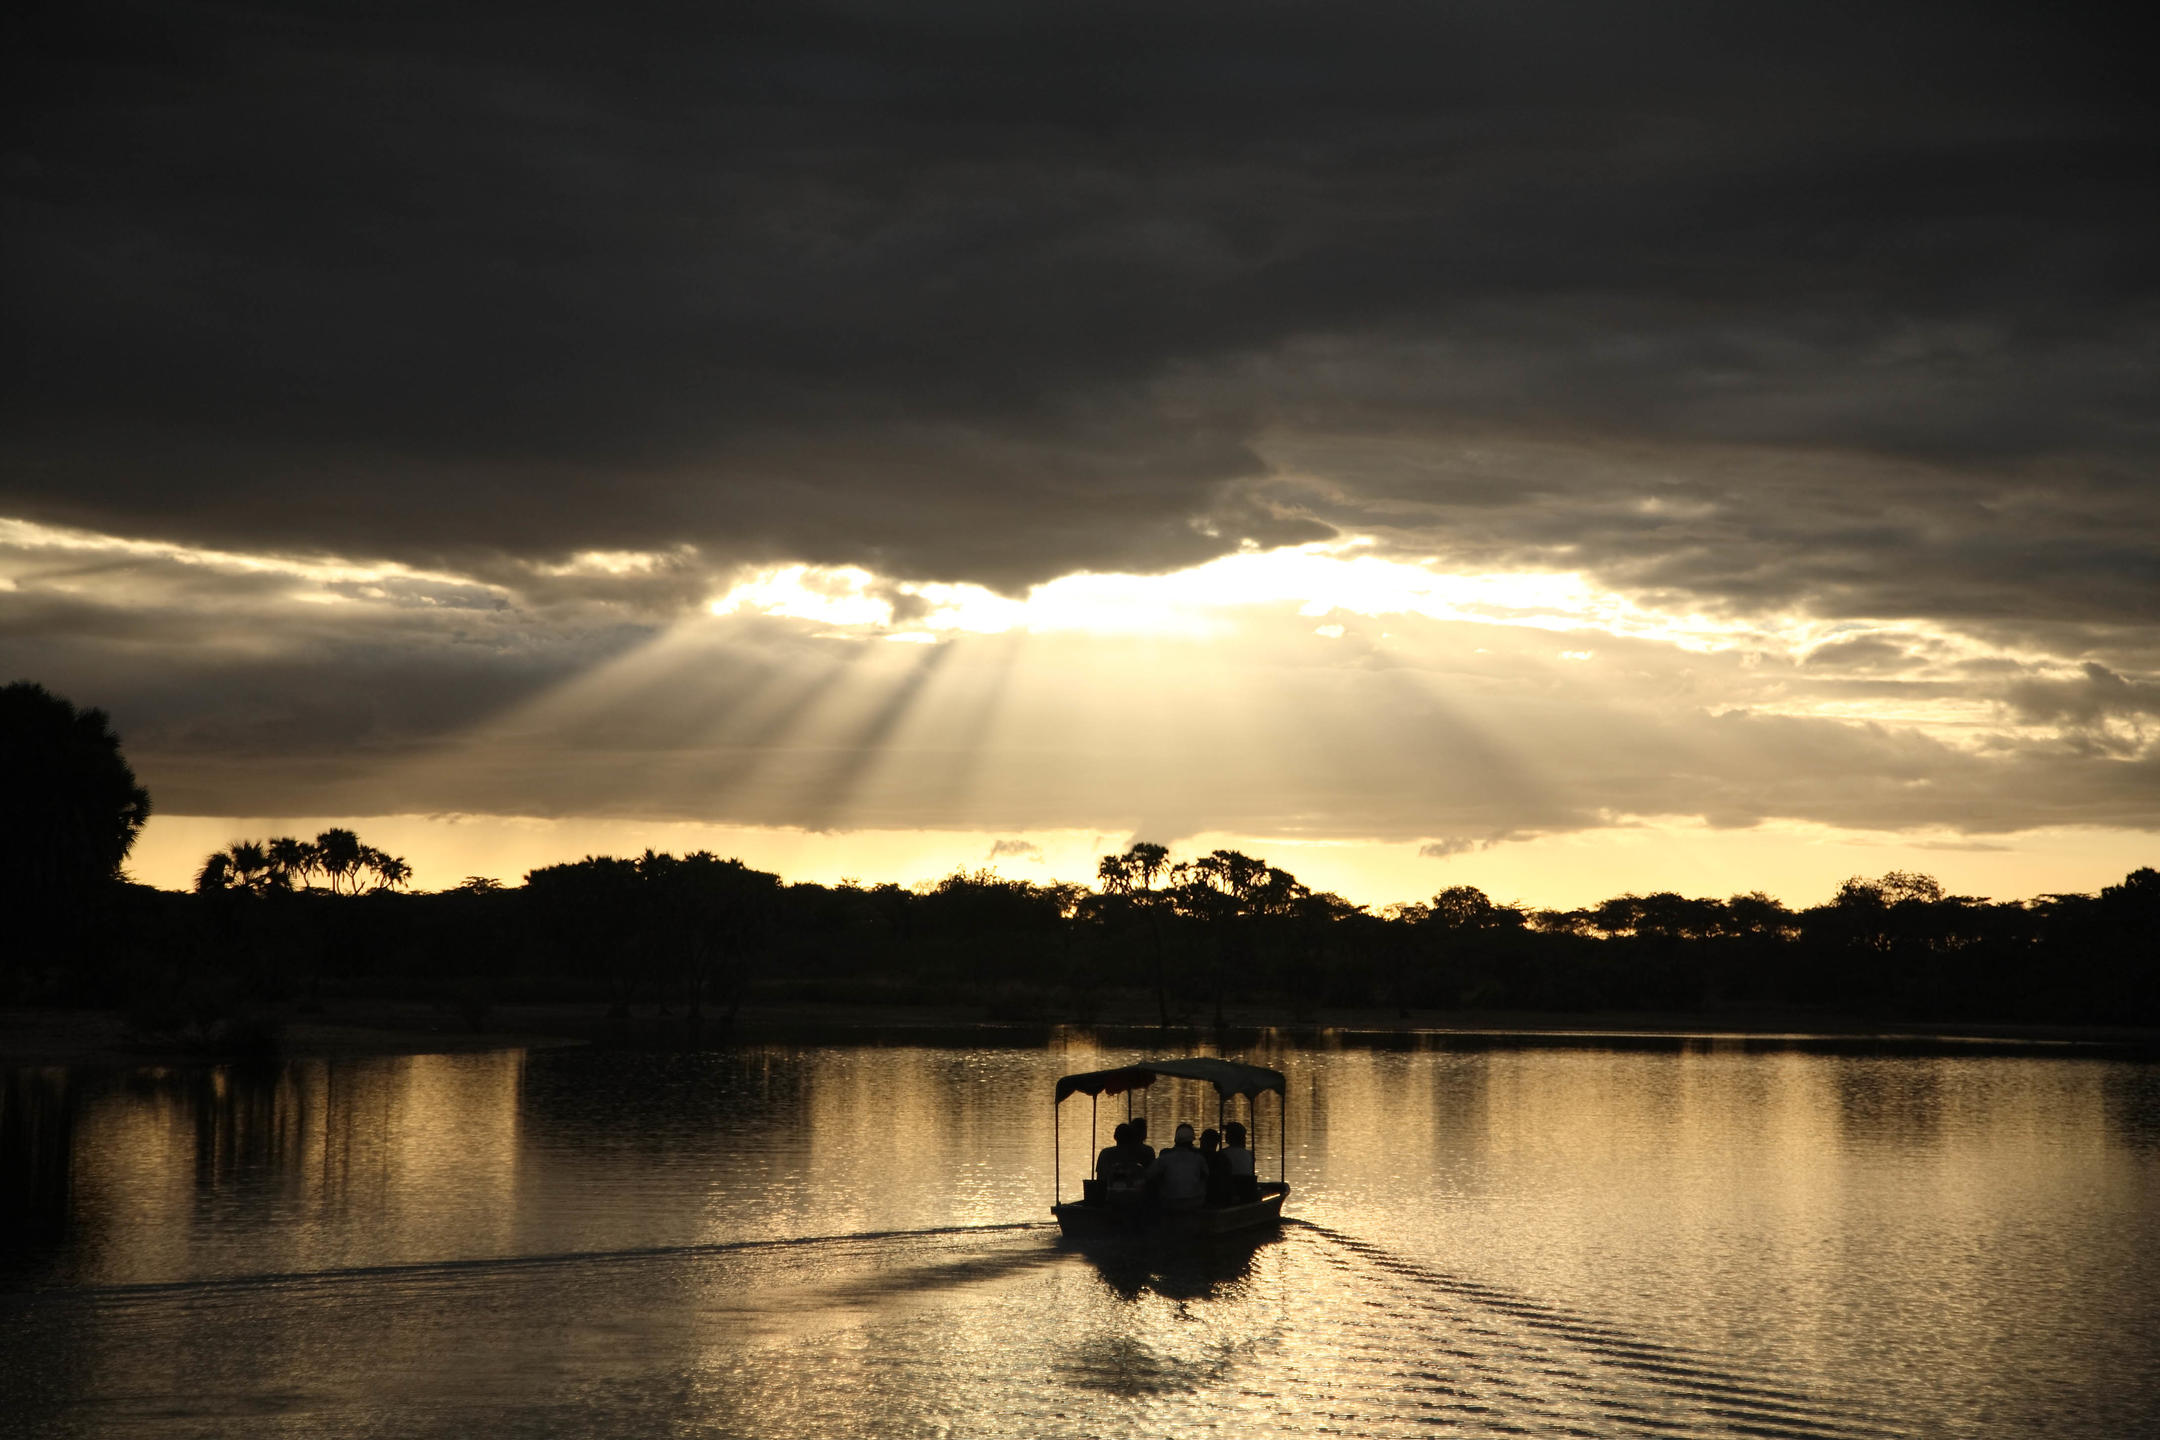 Boat Cruises on the Rufiji River Delta